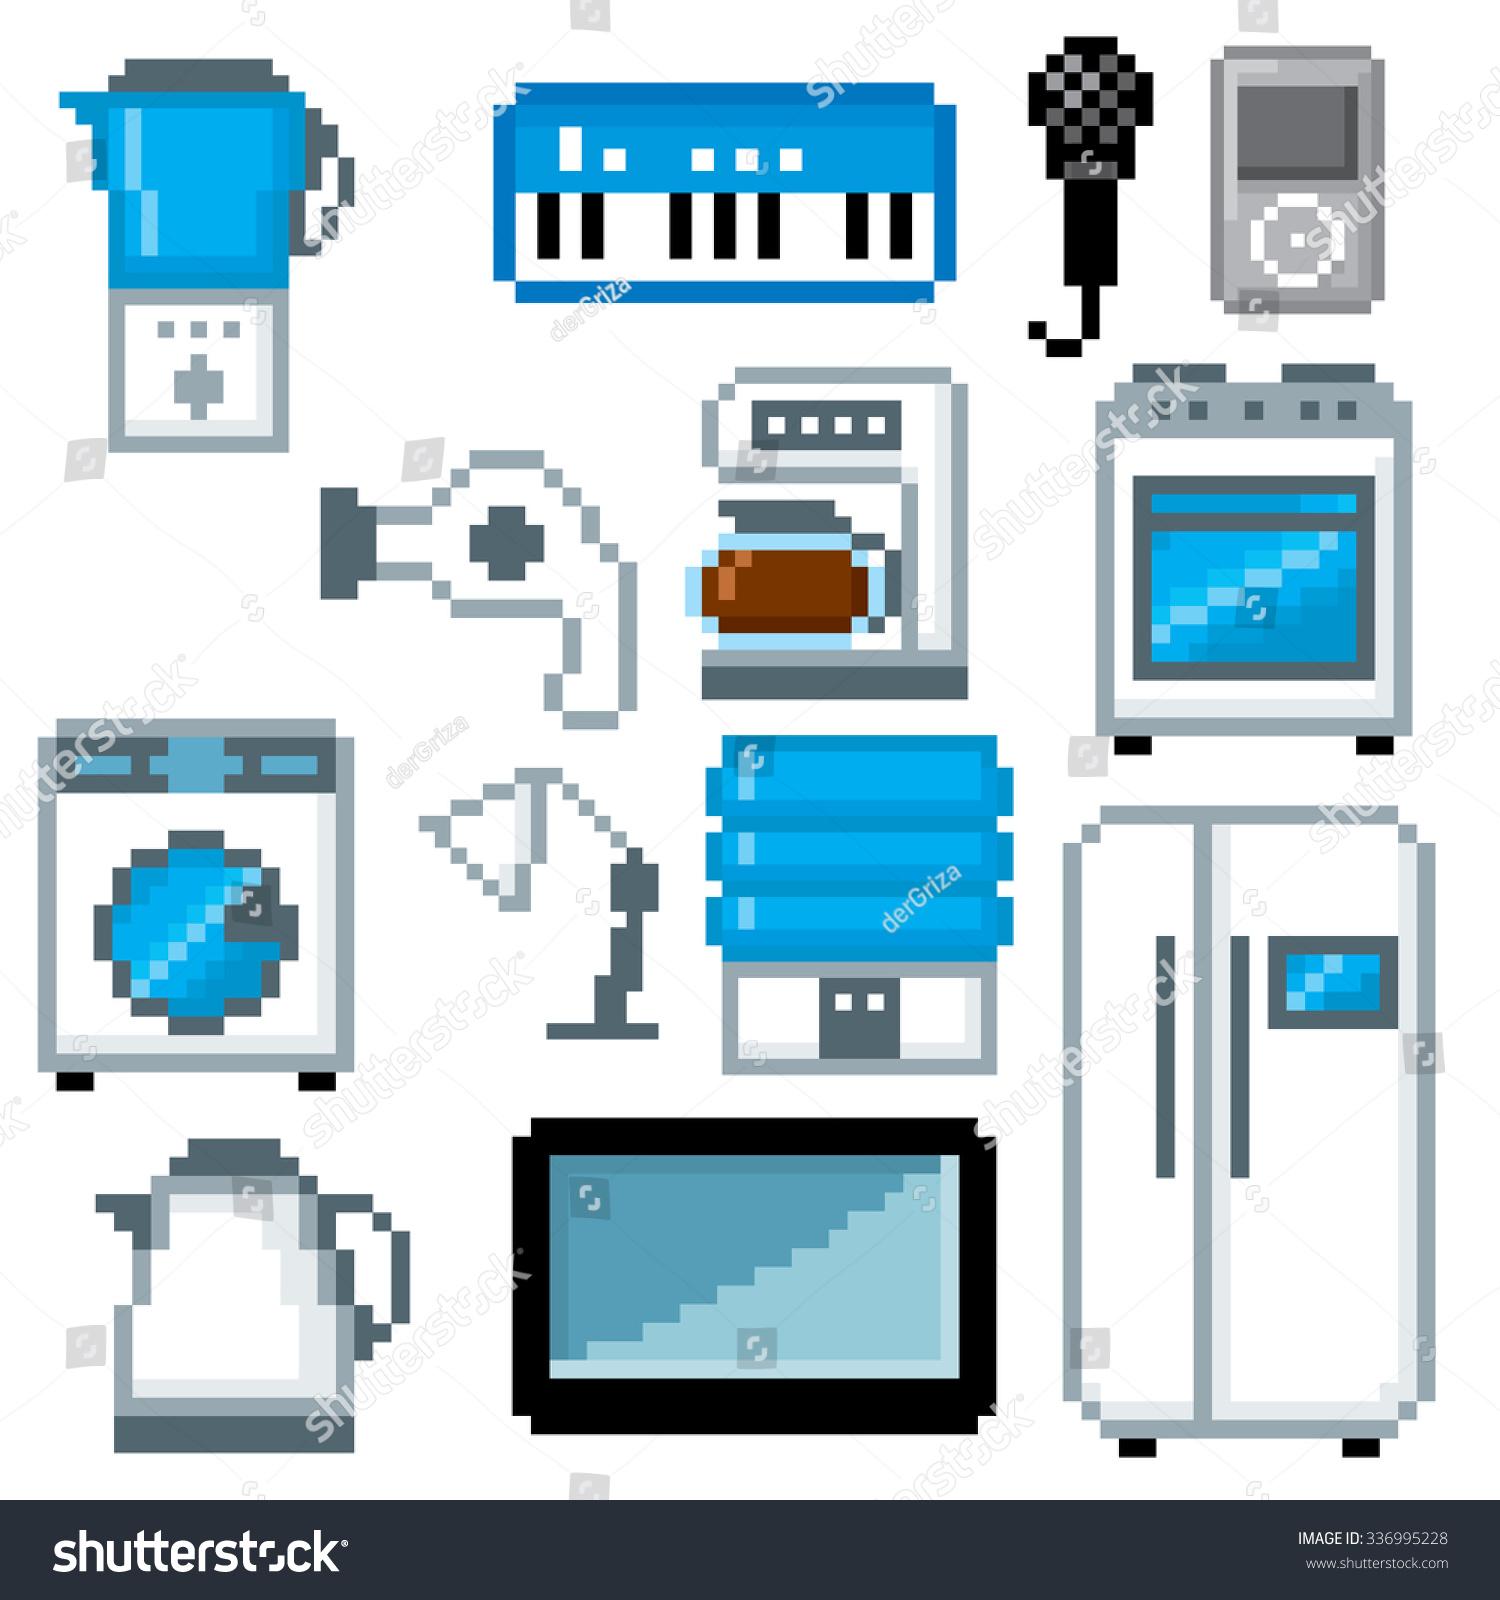 Household Appliances Icon Set Pixel Art Stock Vector HD (Royalty ...